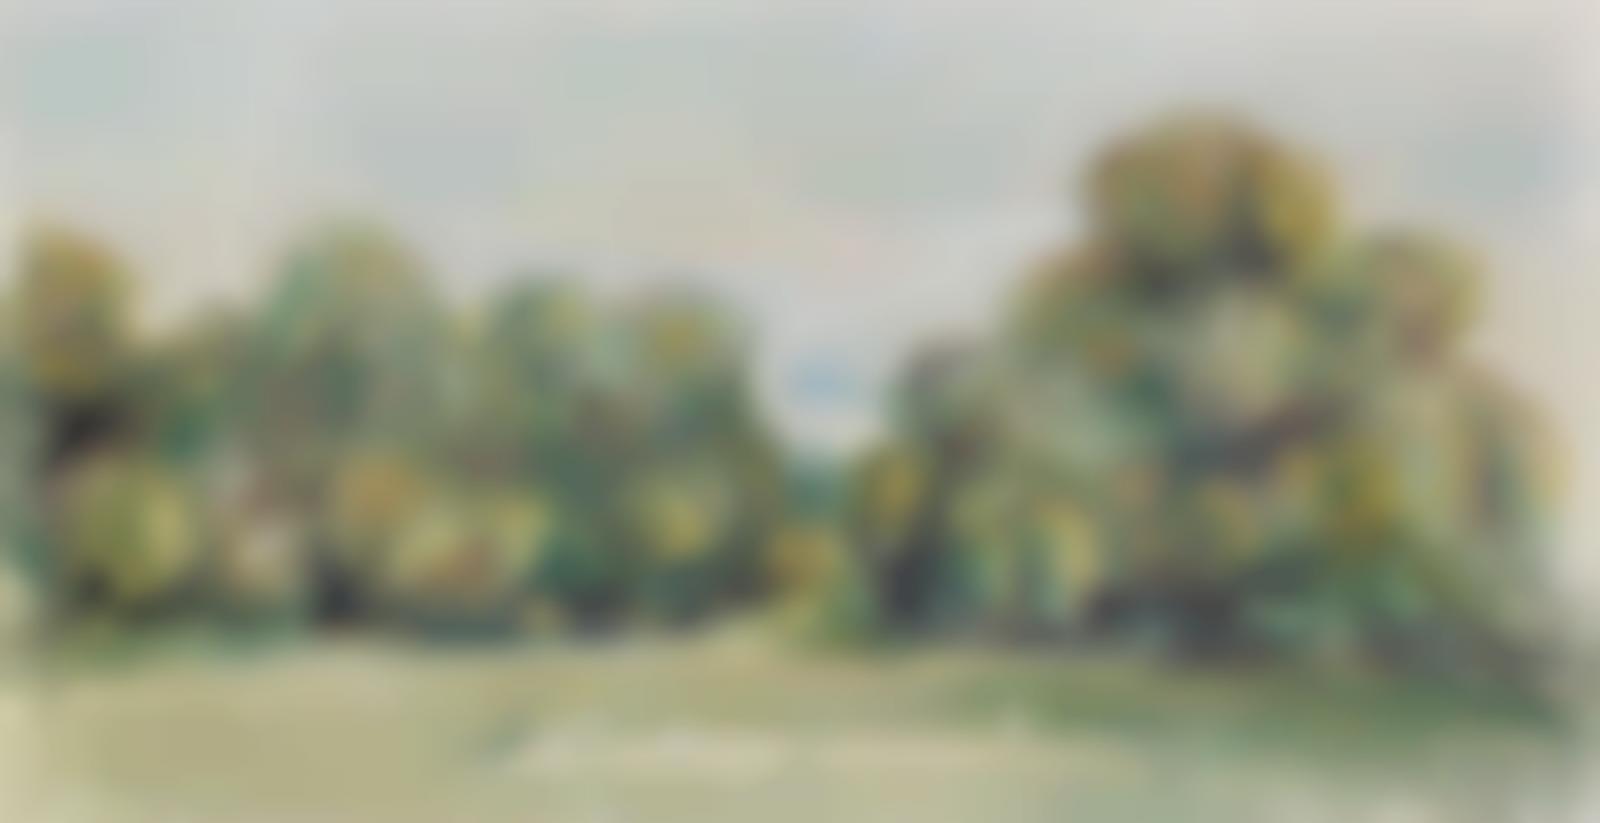 Pierre-Auguste Renoir-La partie de tennis-1895